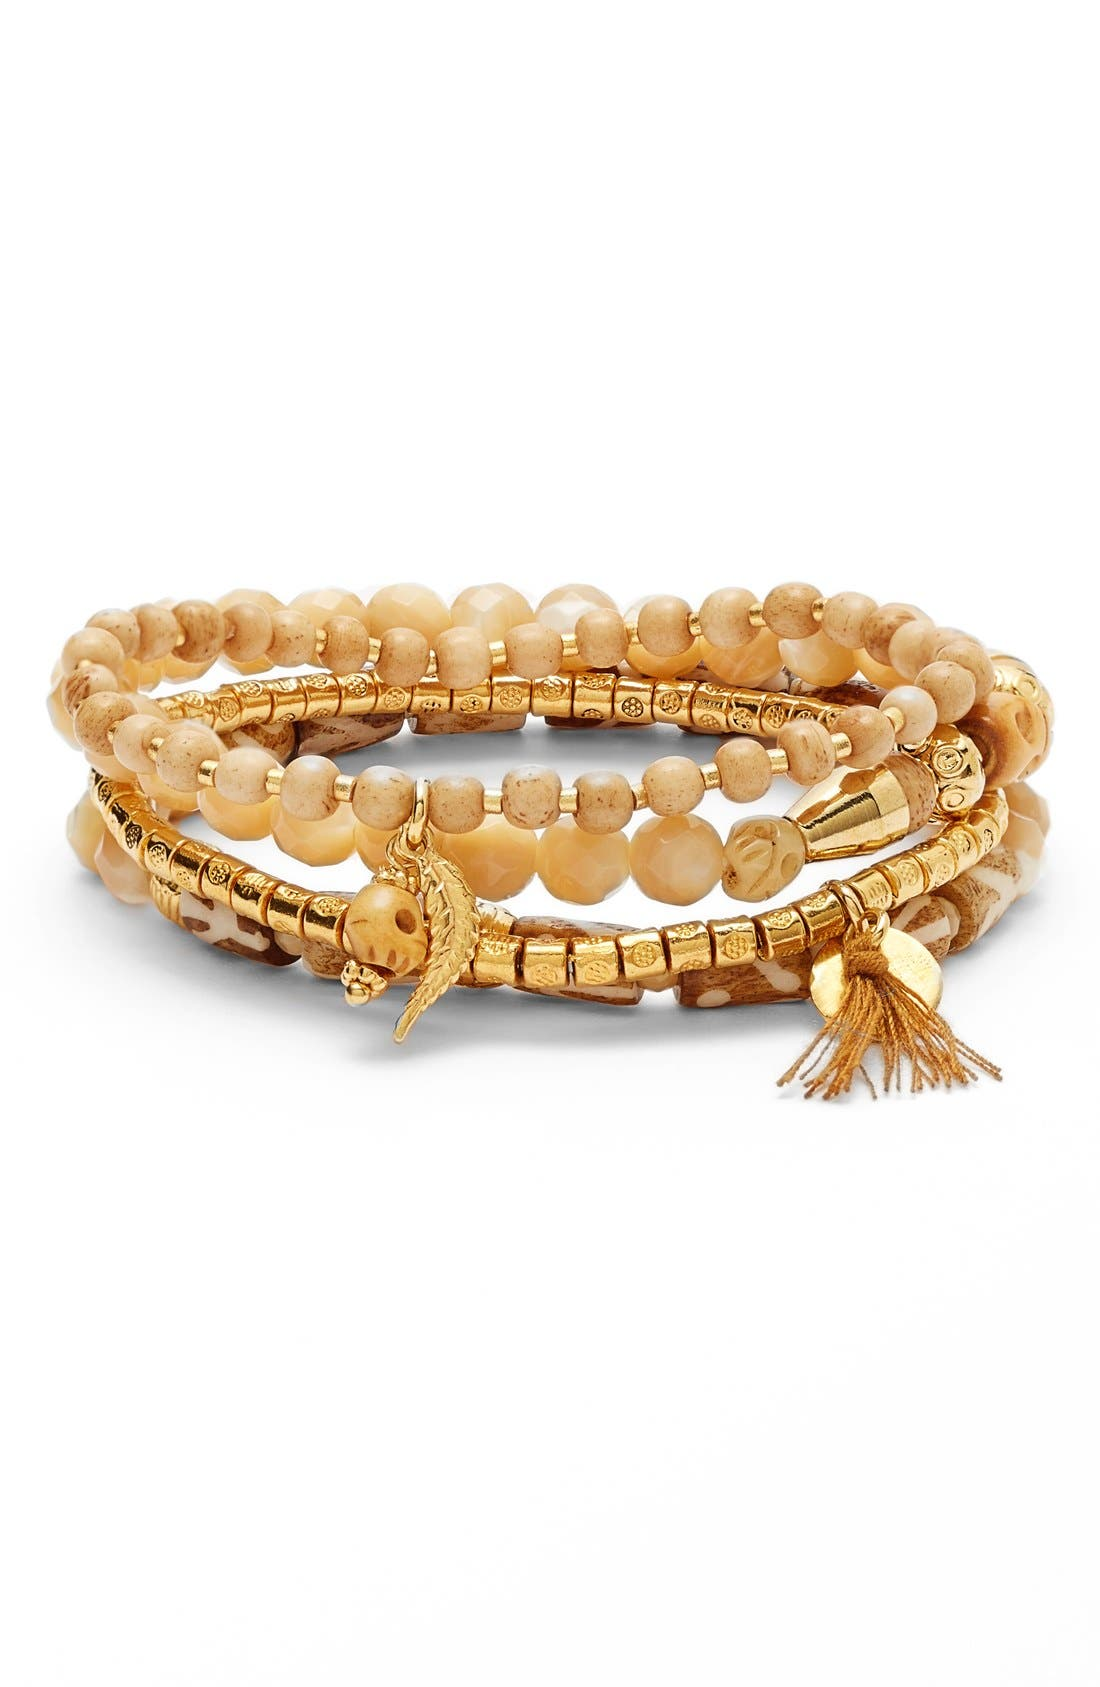 Alternate Image 1 Selected - Chan Luu Beaded Stretch Bracelets (Set of 4)